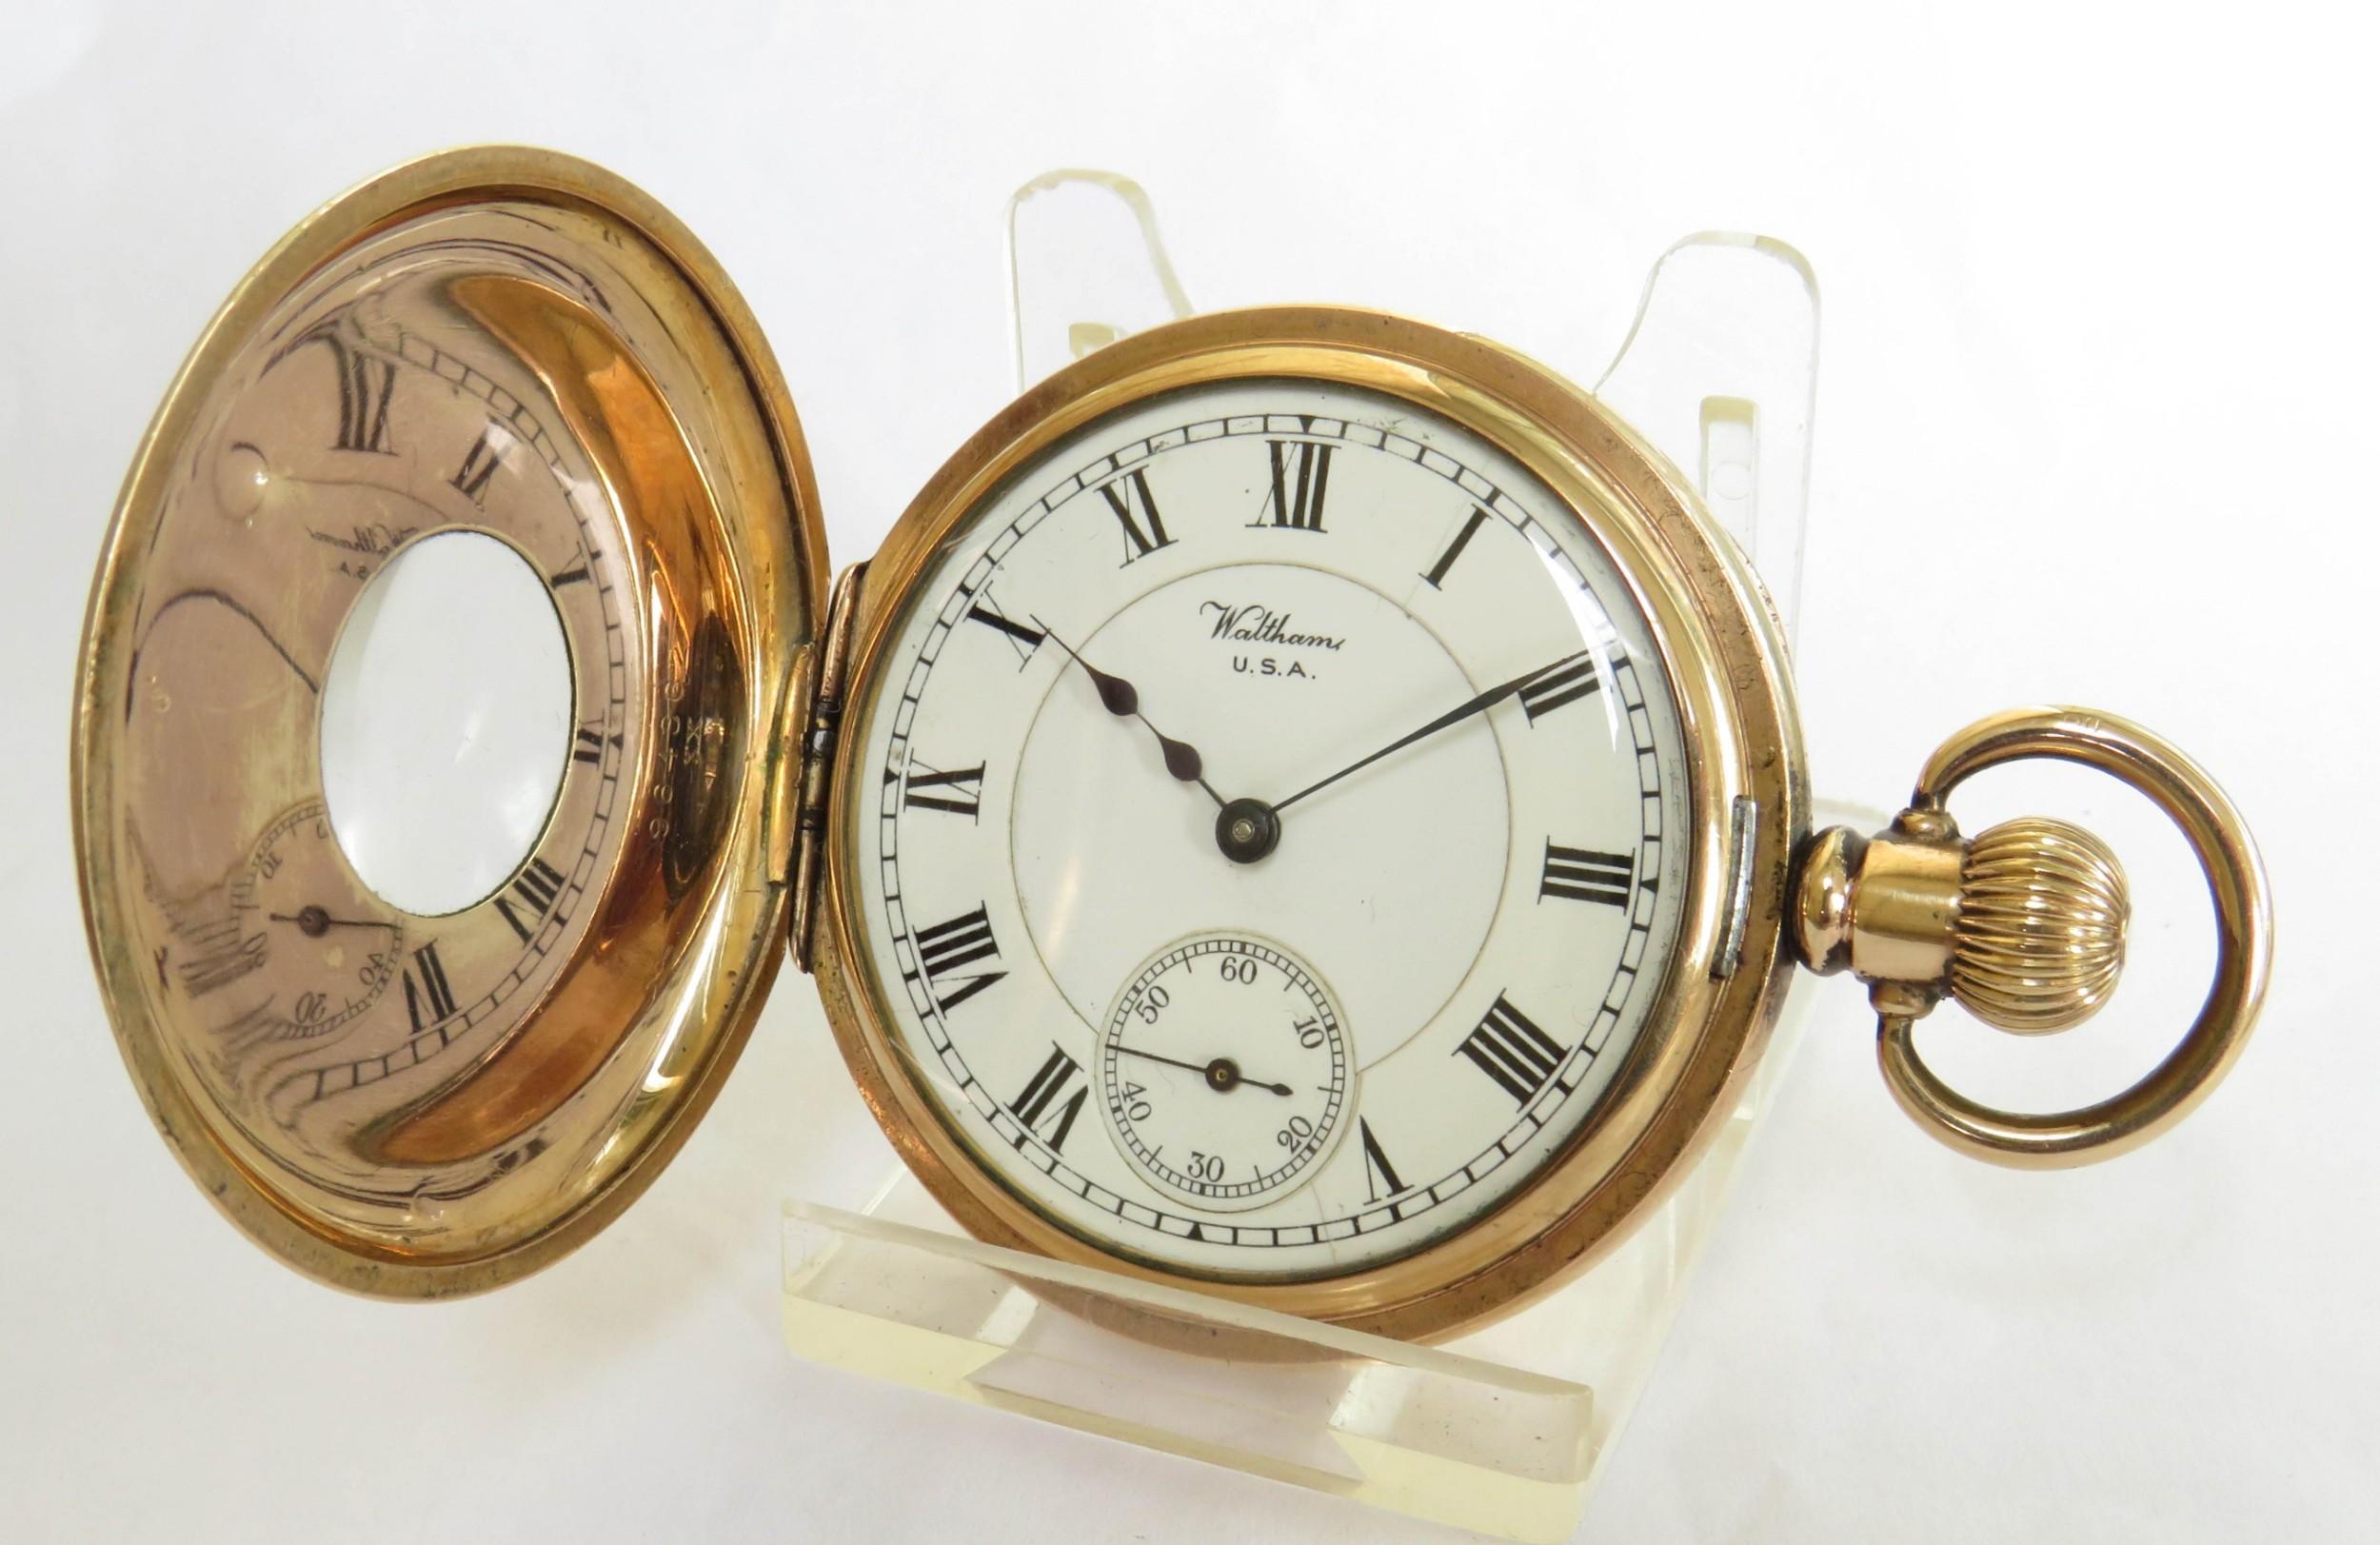 waltham vanguard rail road grade pocket watch